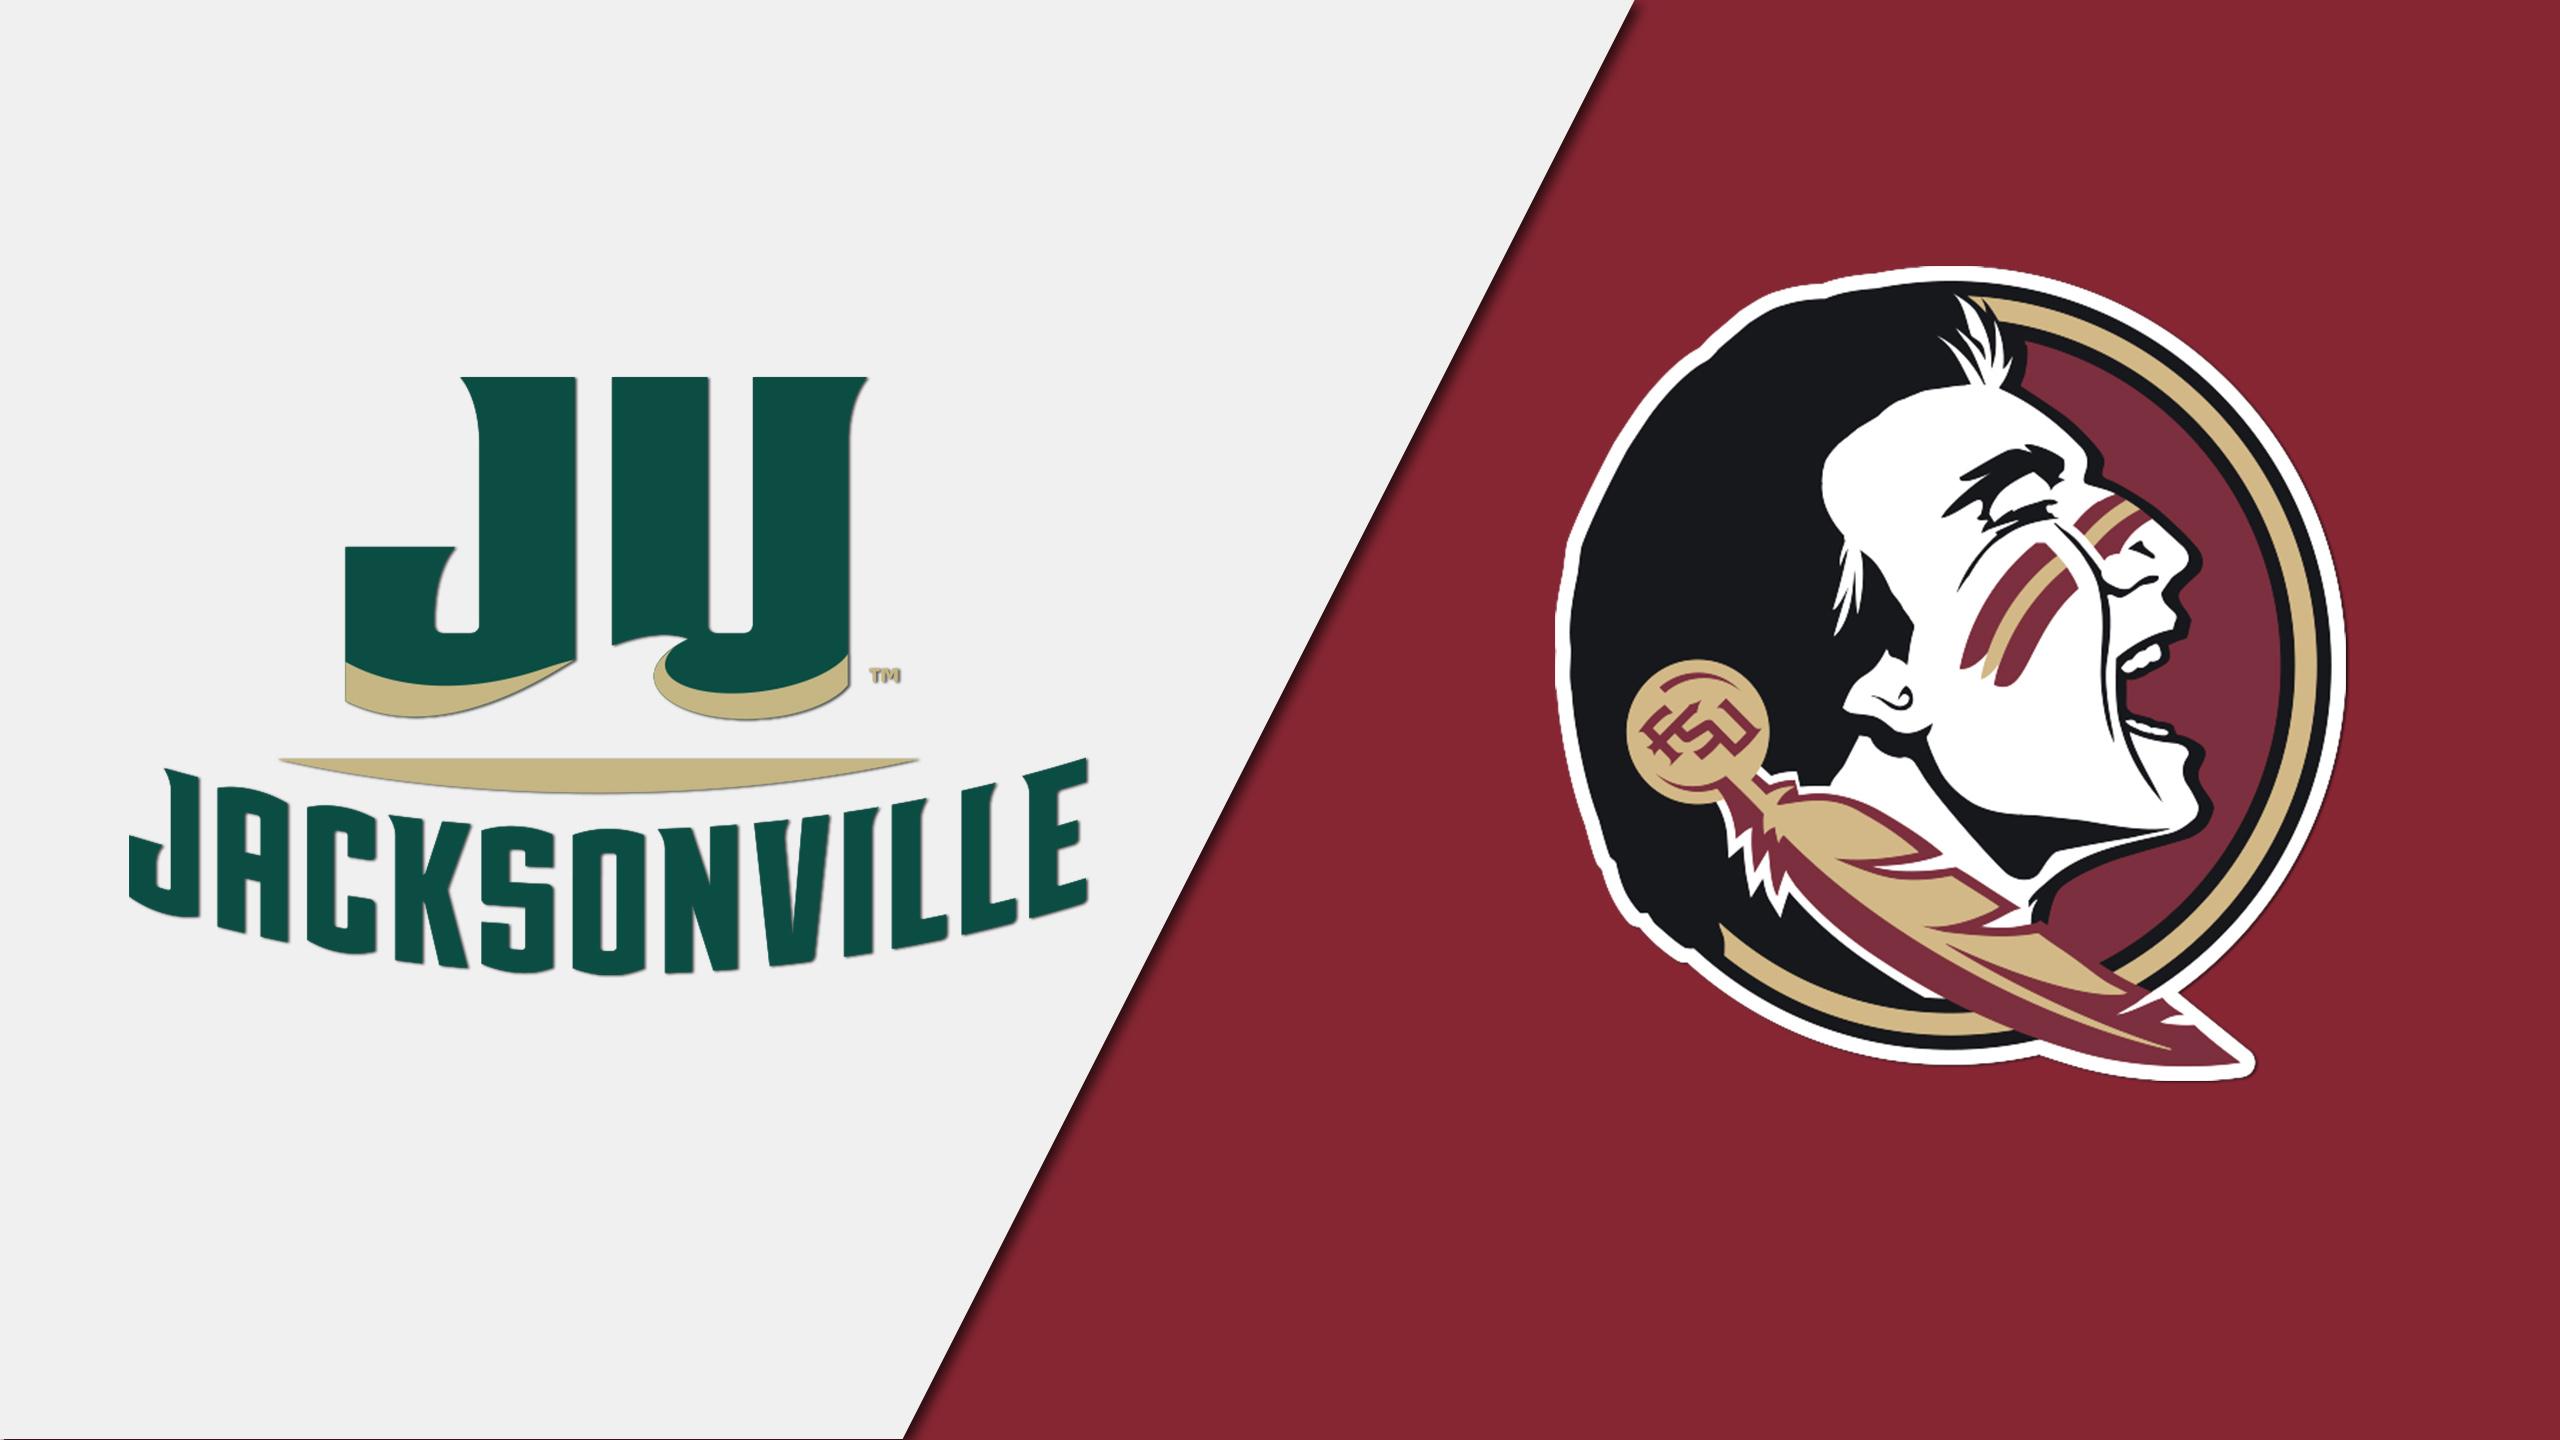 Jacksonville vs. Florida State